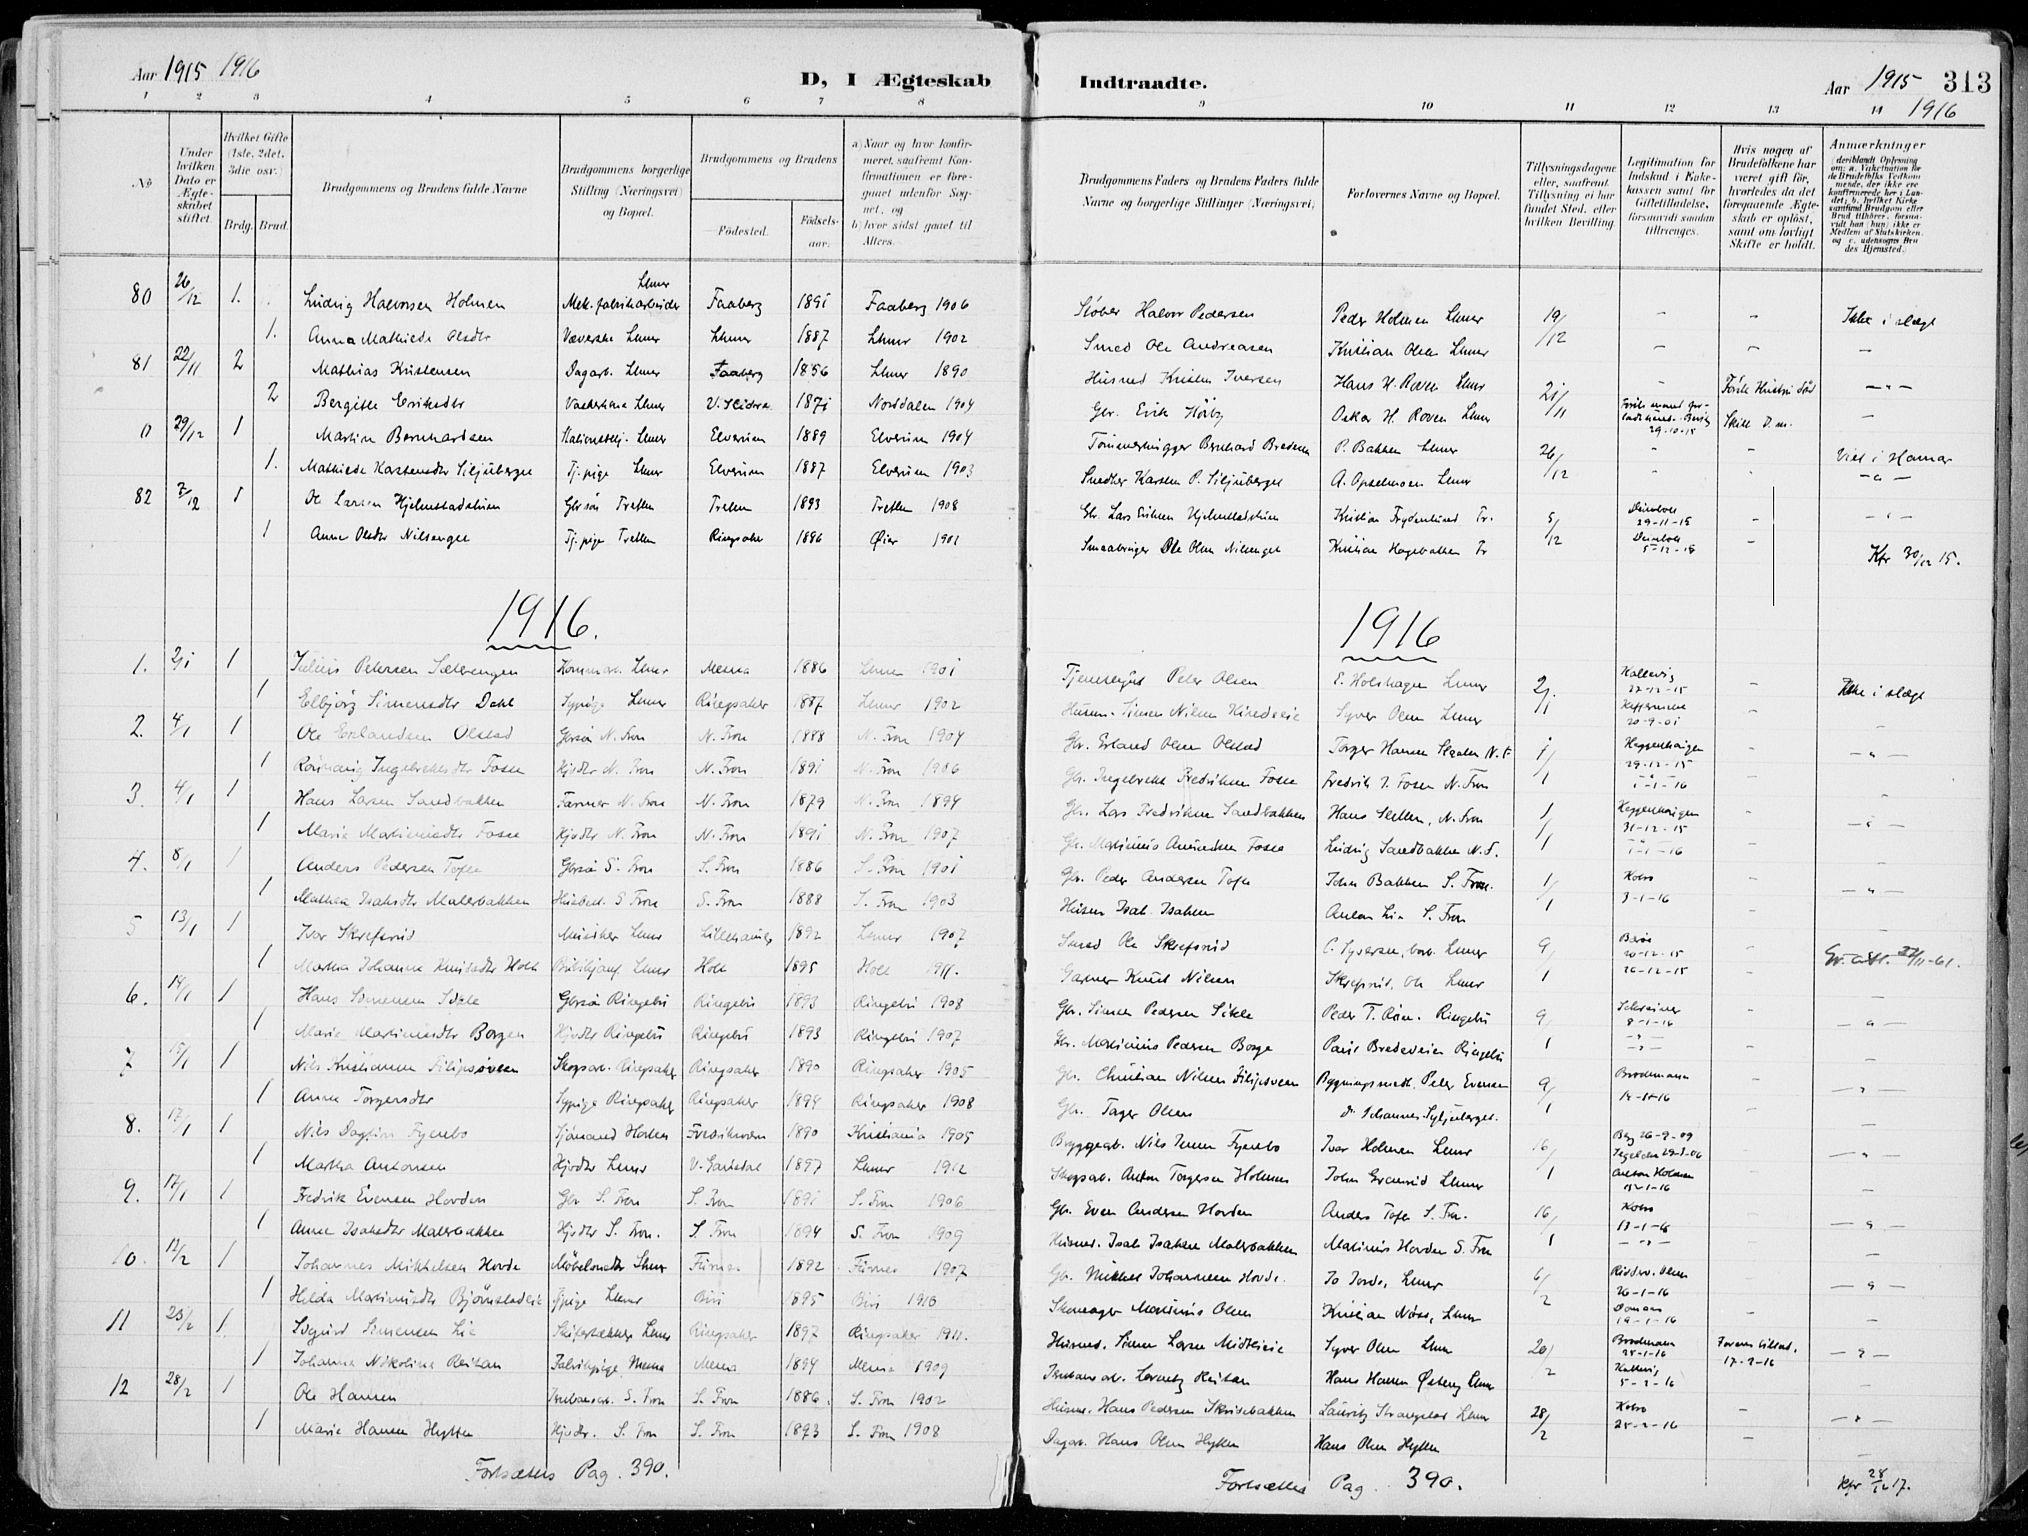 SAH, Lillehammer prestekontor, Ministerialbok nr. 1, 1901-1916, s. 313